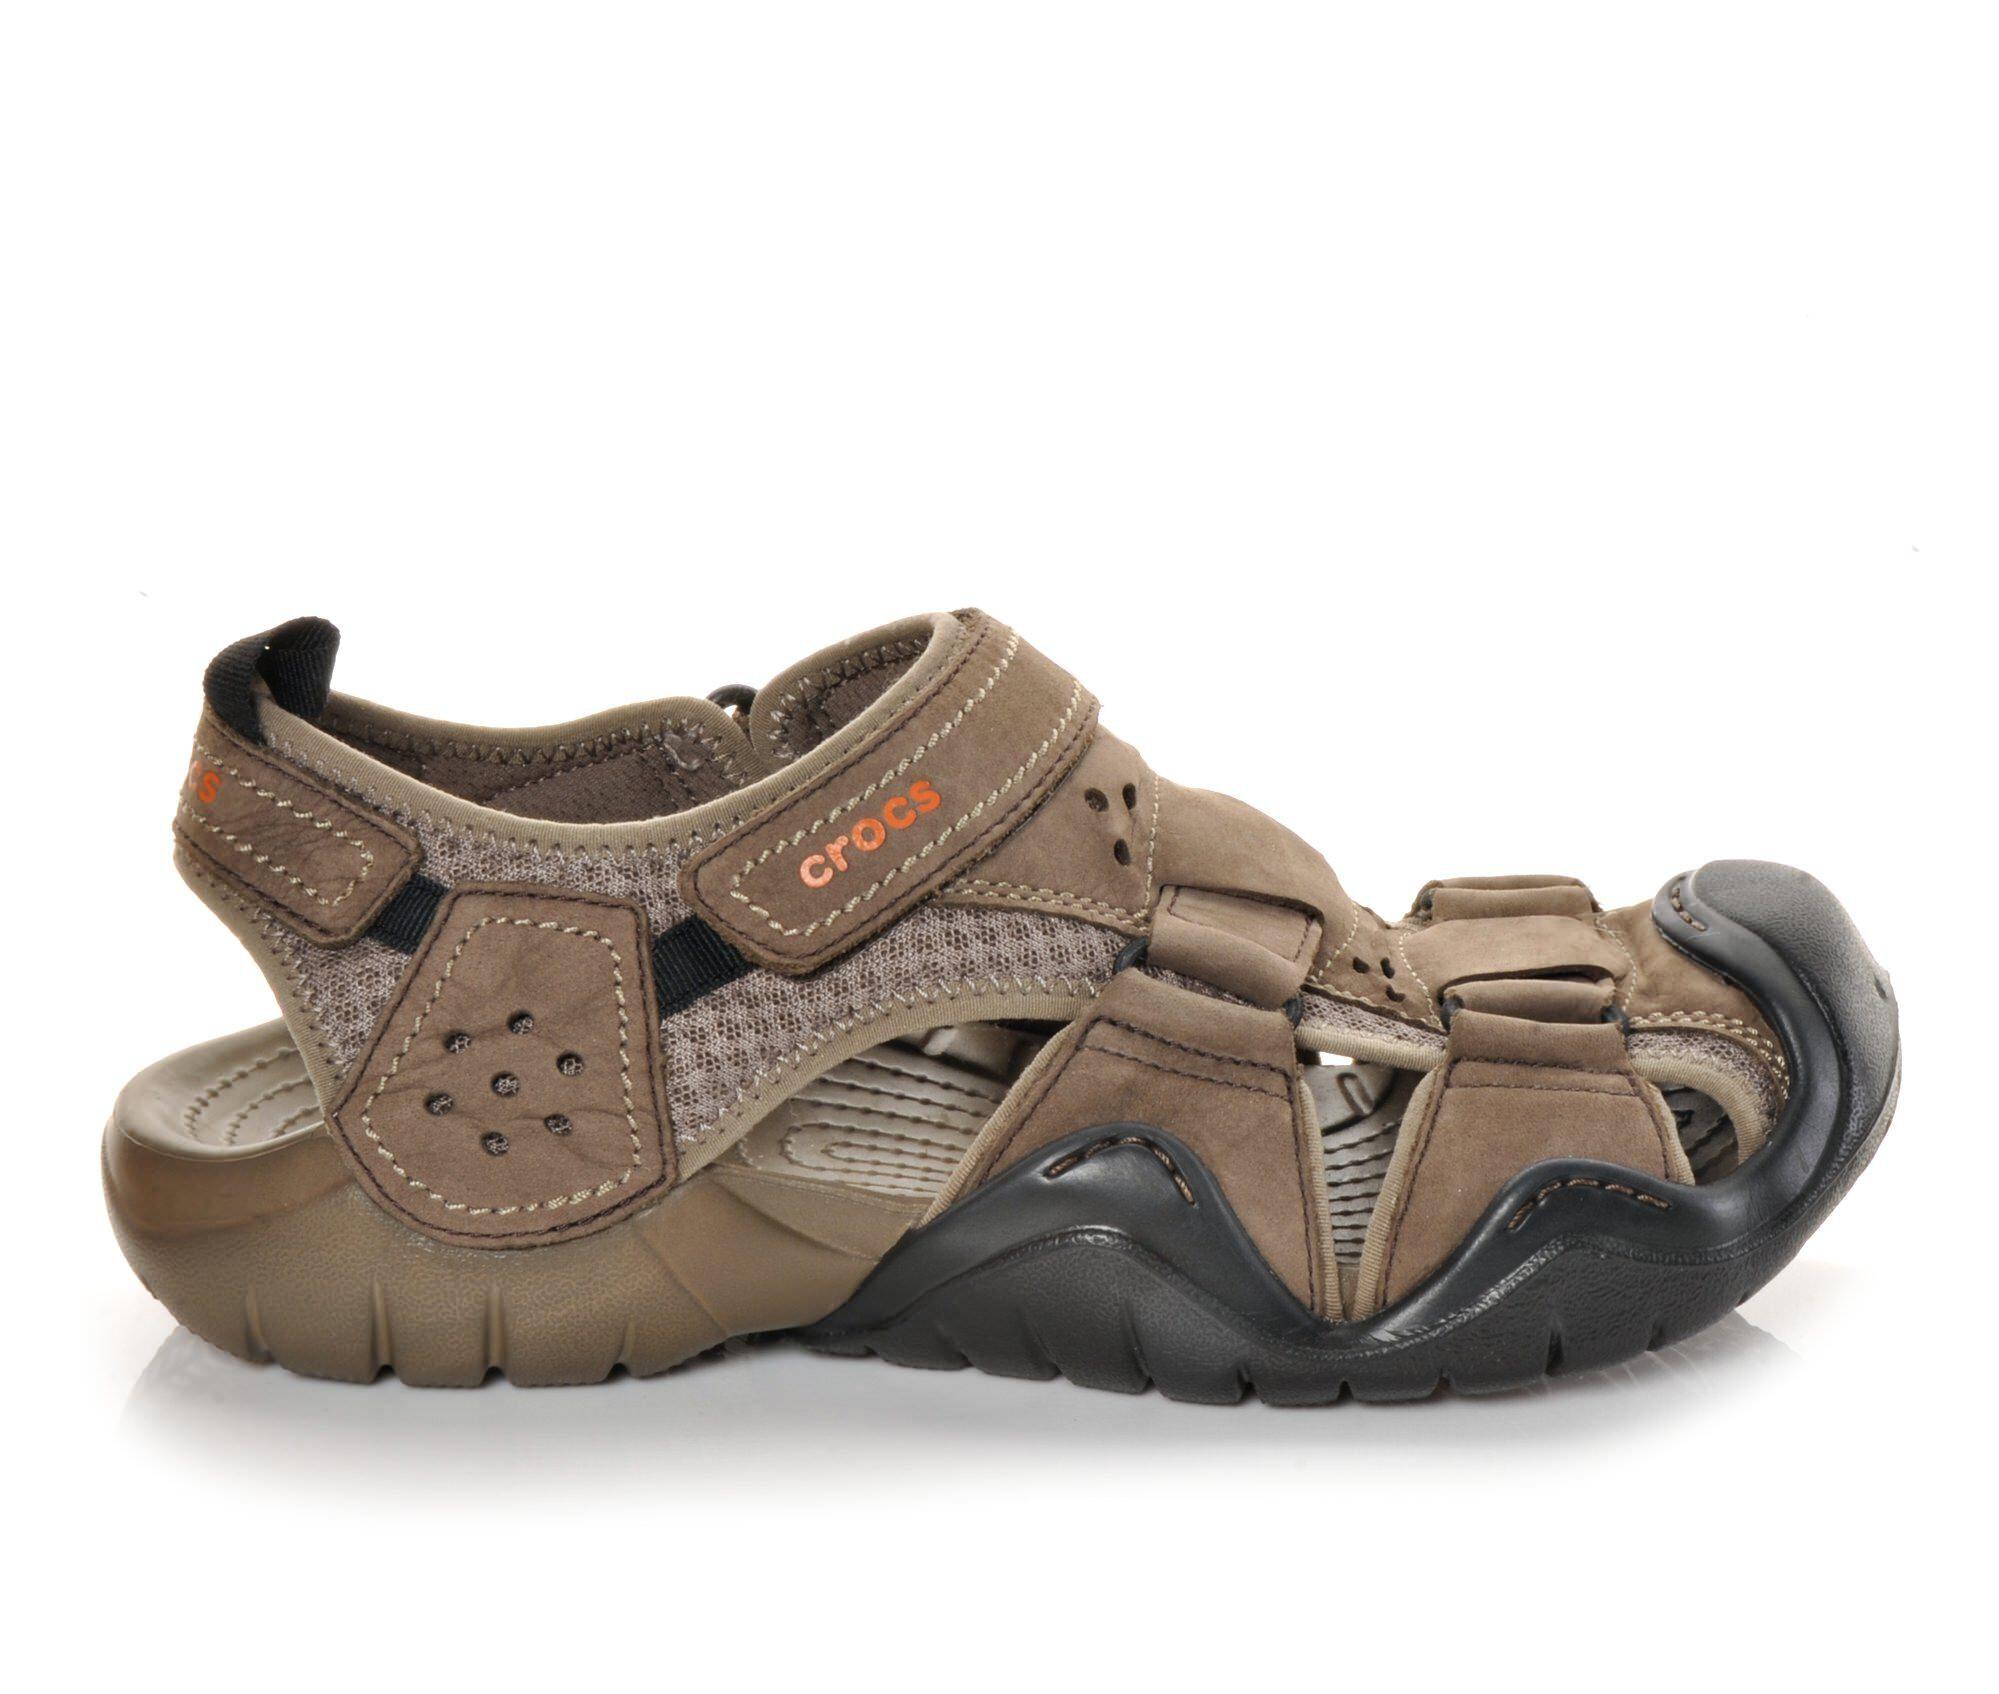 Crocs Shoes  Crocs Swiftwater Leather Fisherman Mens Casual Shoes EspressoWalnut